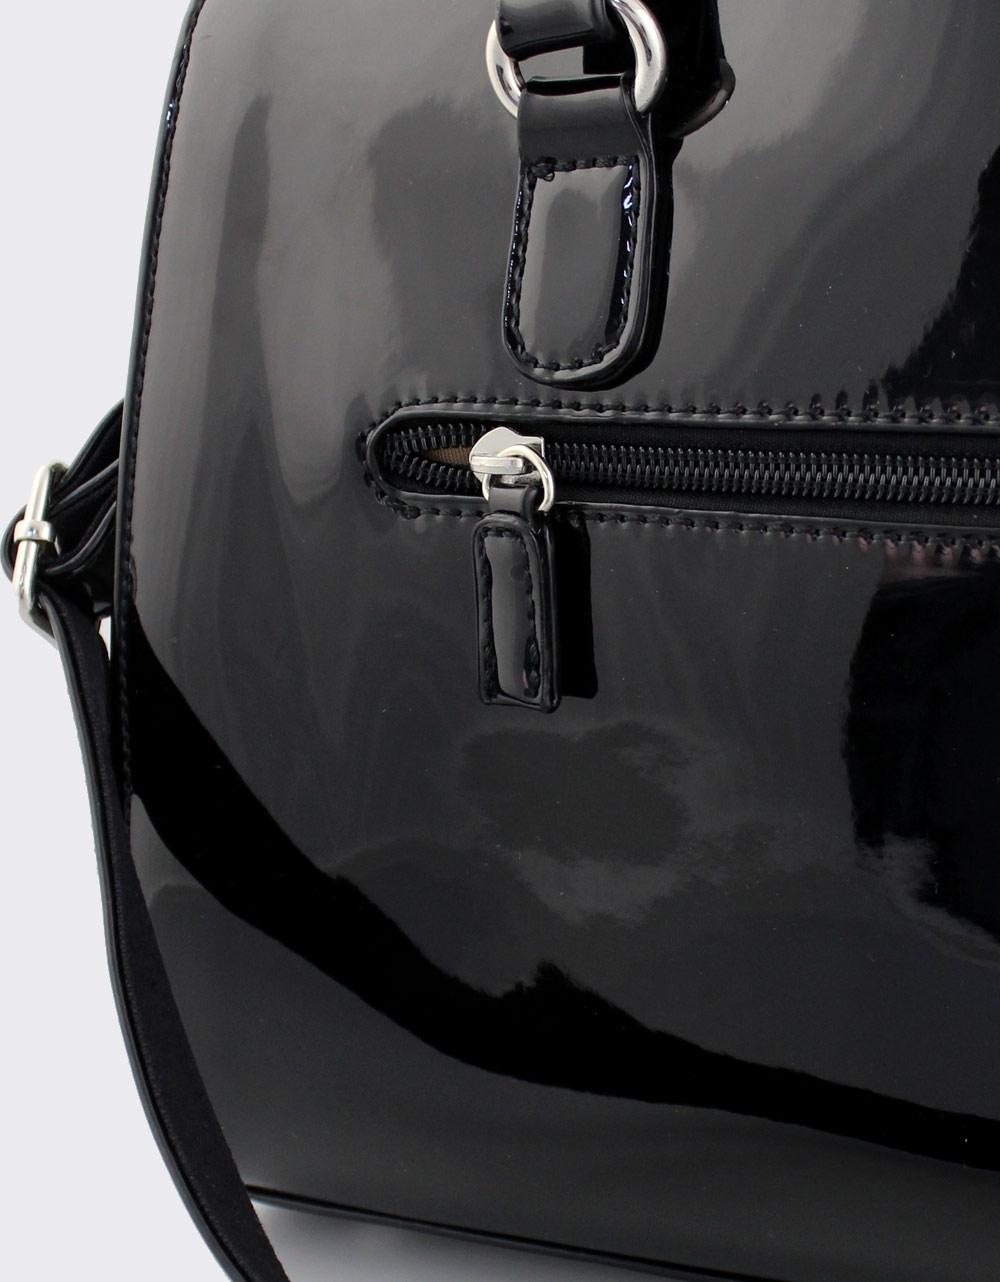 a457d0f45b Εικόνα από Γυναικείες τσάντες χειρός λουστρίνι Μαύρο